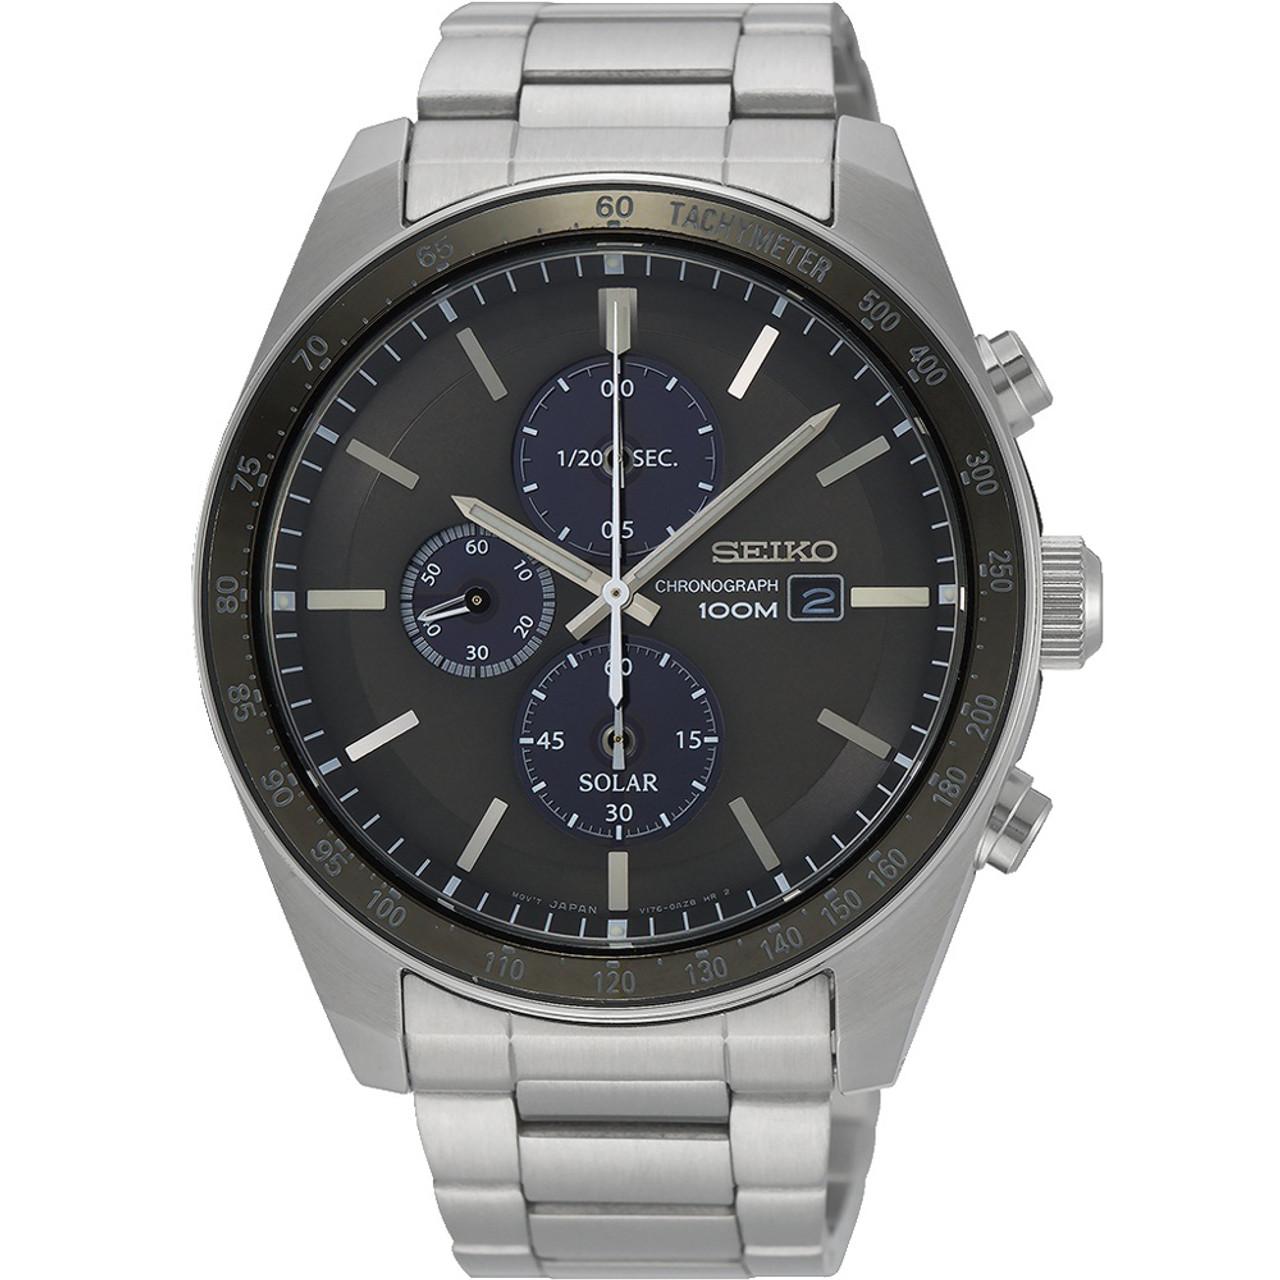 eef848e3e Seiko Men's Tachymeter Chronograph Solar Grey Dial Silver Bracelet Watch  SSC715P1